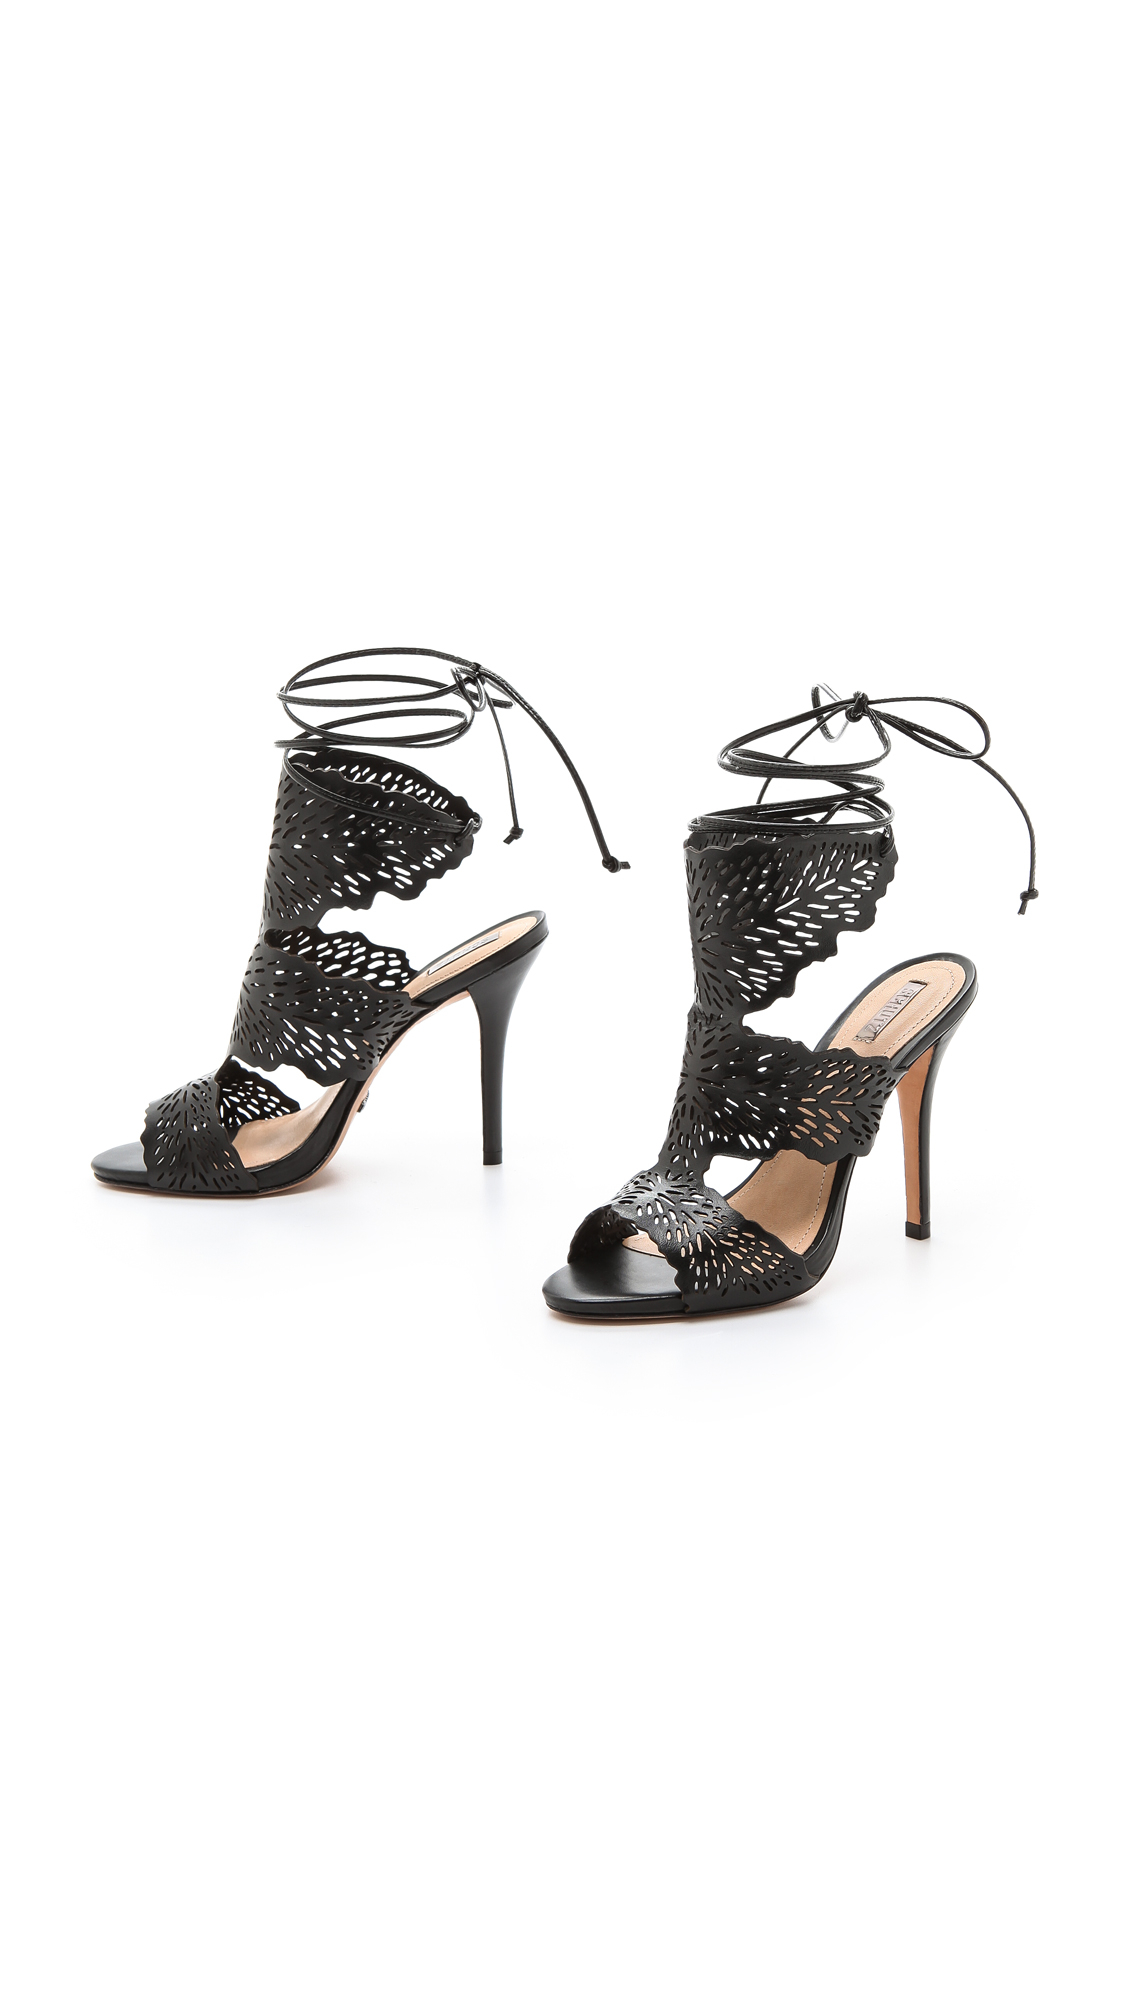 Schutz Laser cut sandals rgn8z